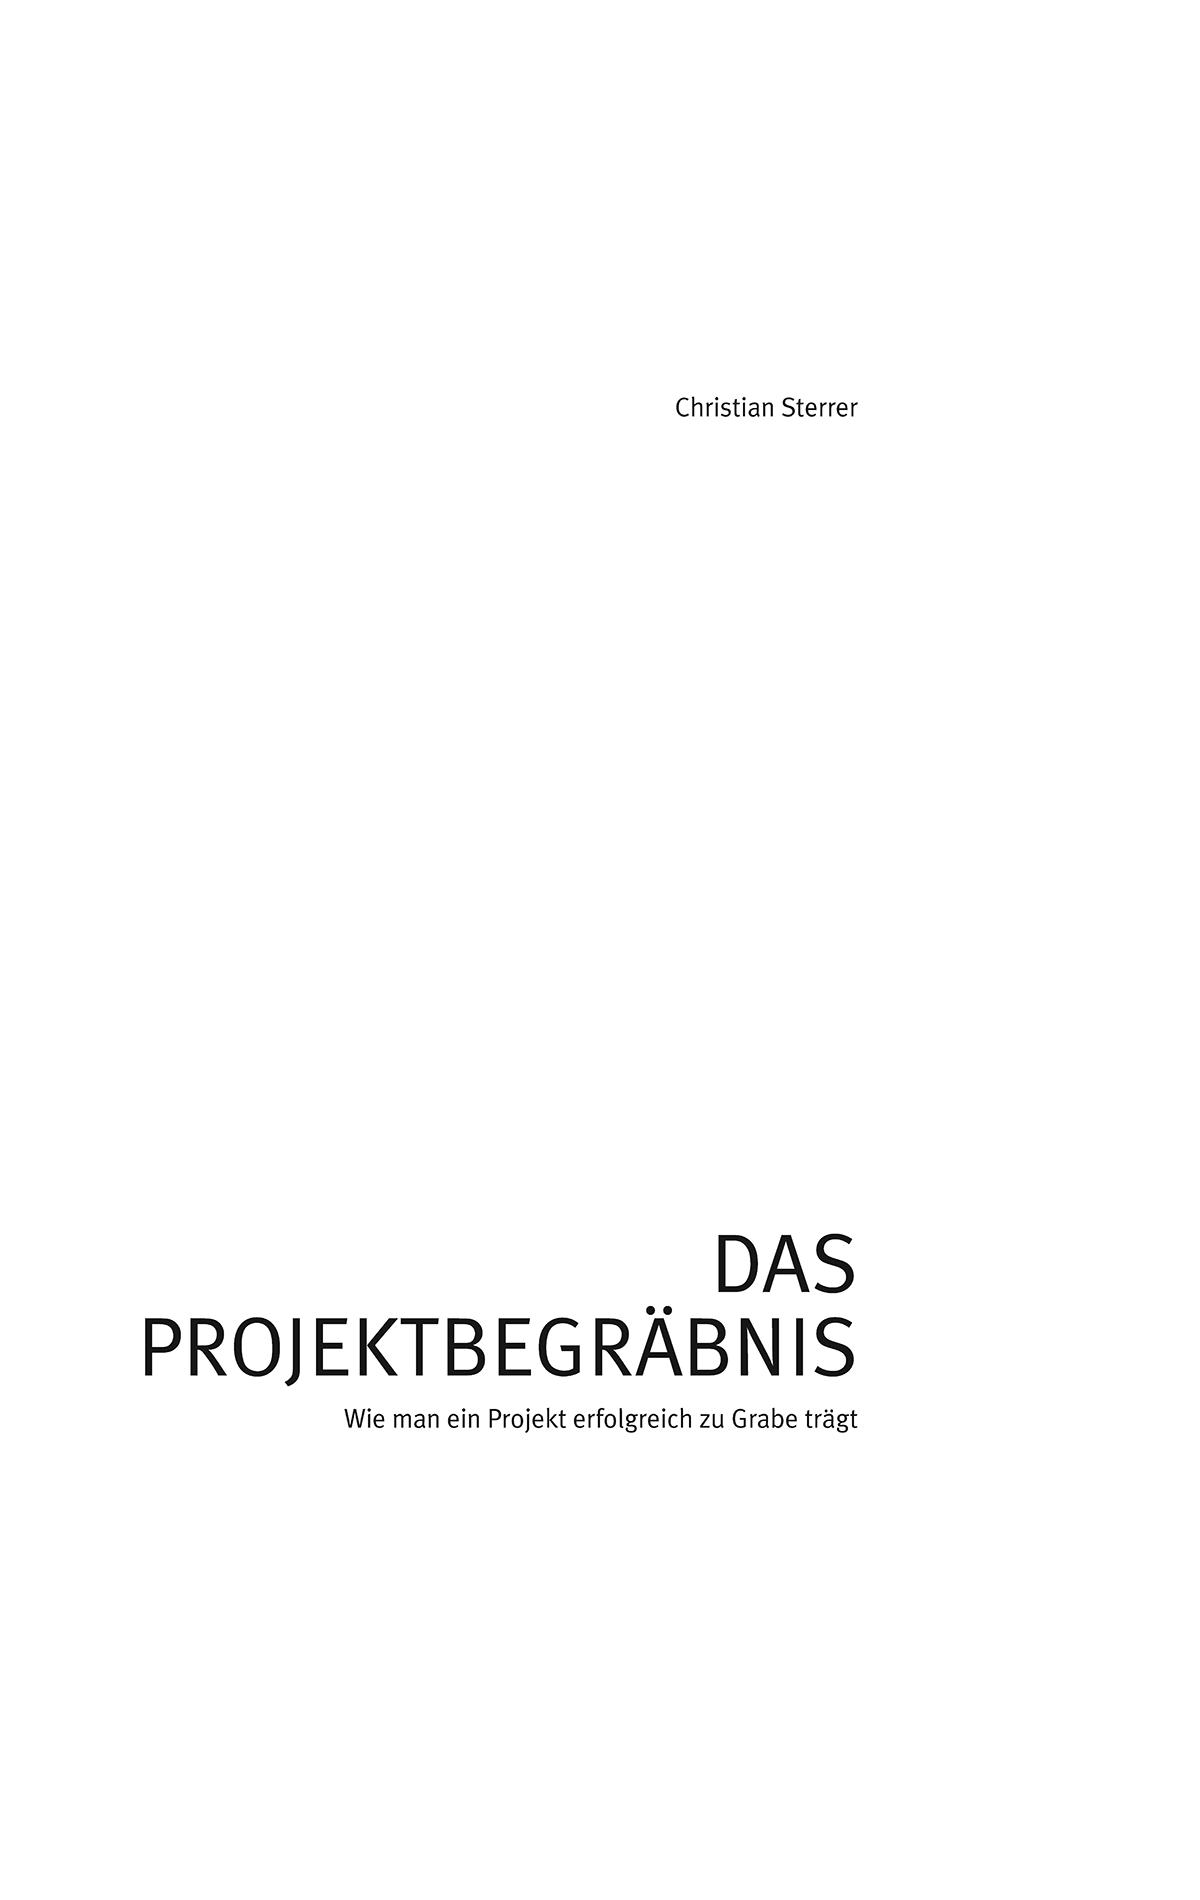 Christian-Sterrer_Das-Projektbegraebnis_Cover_151015_PR